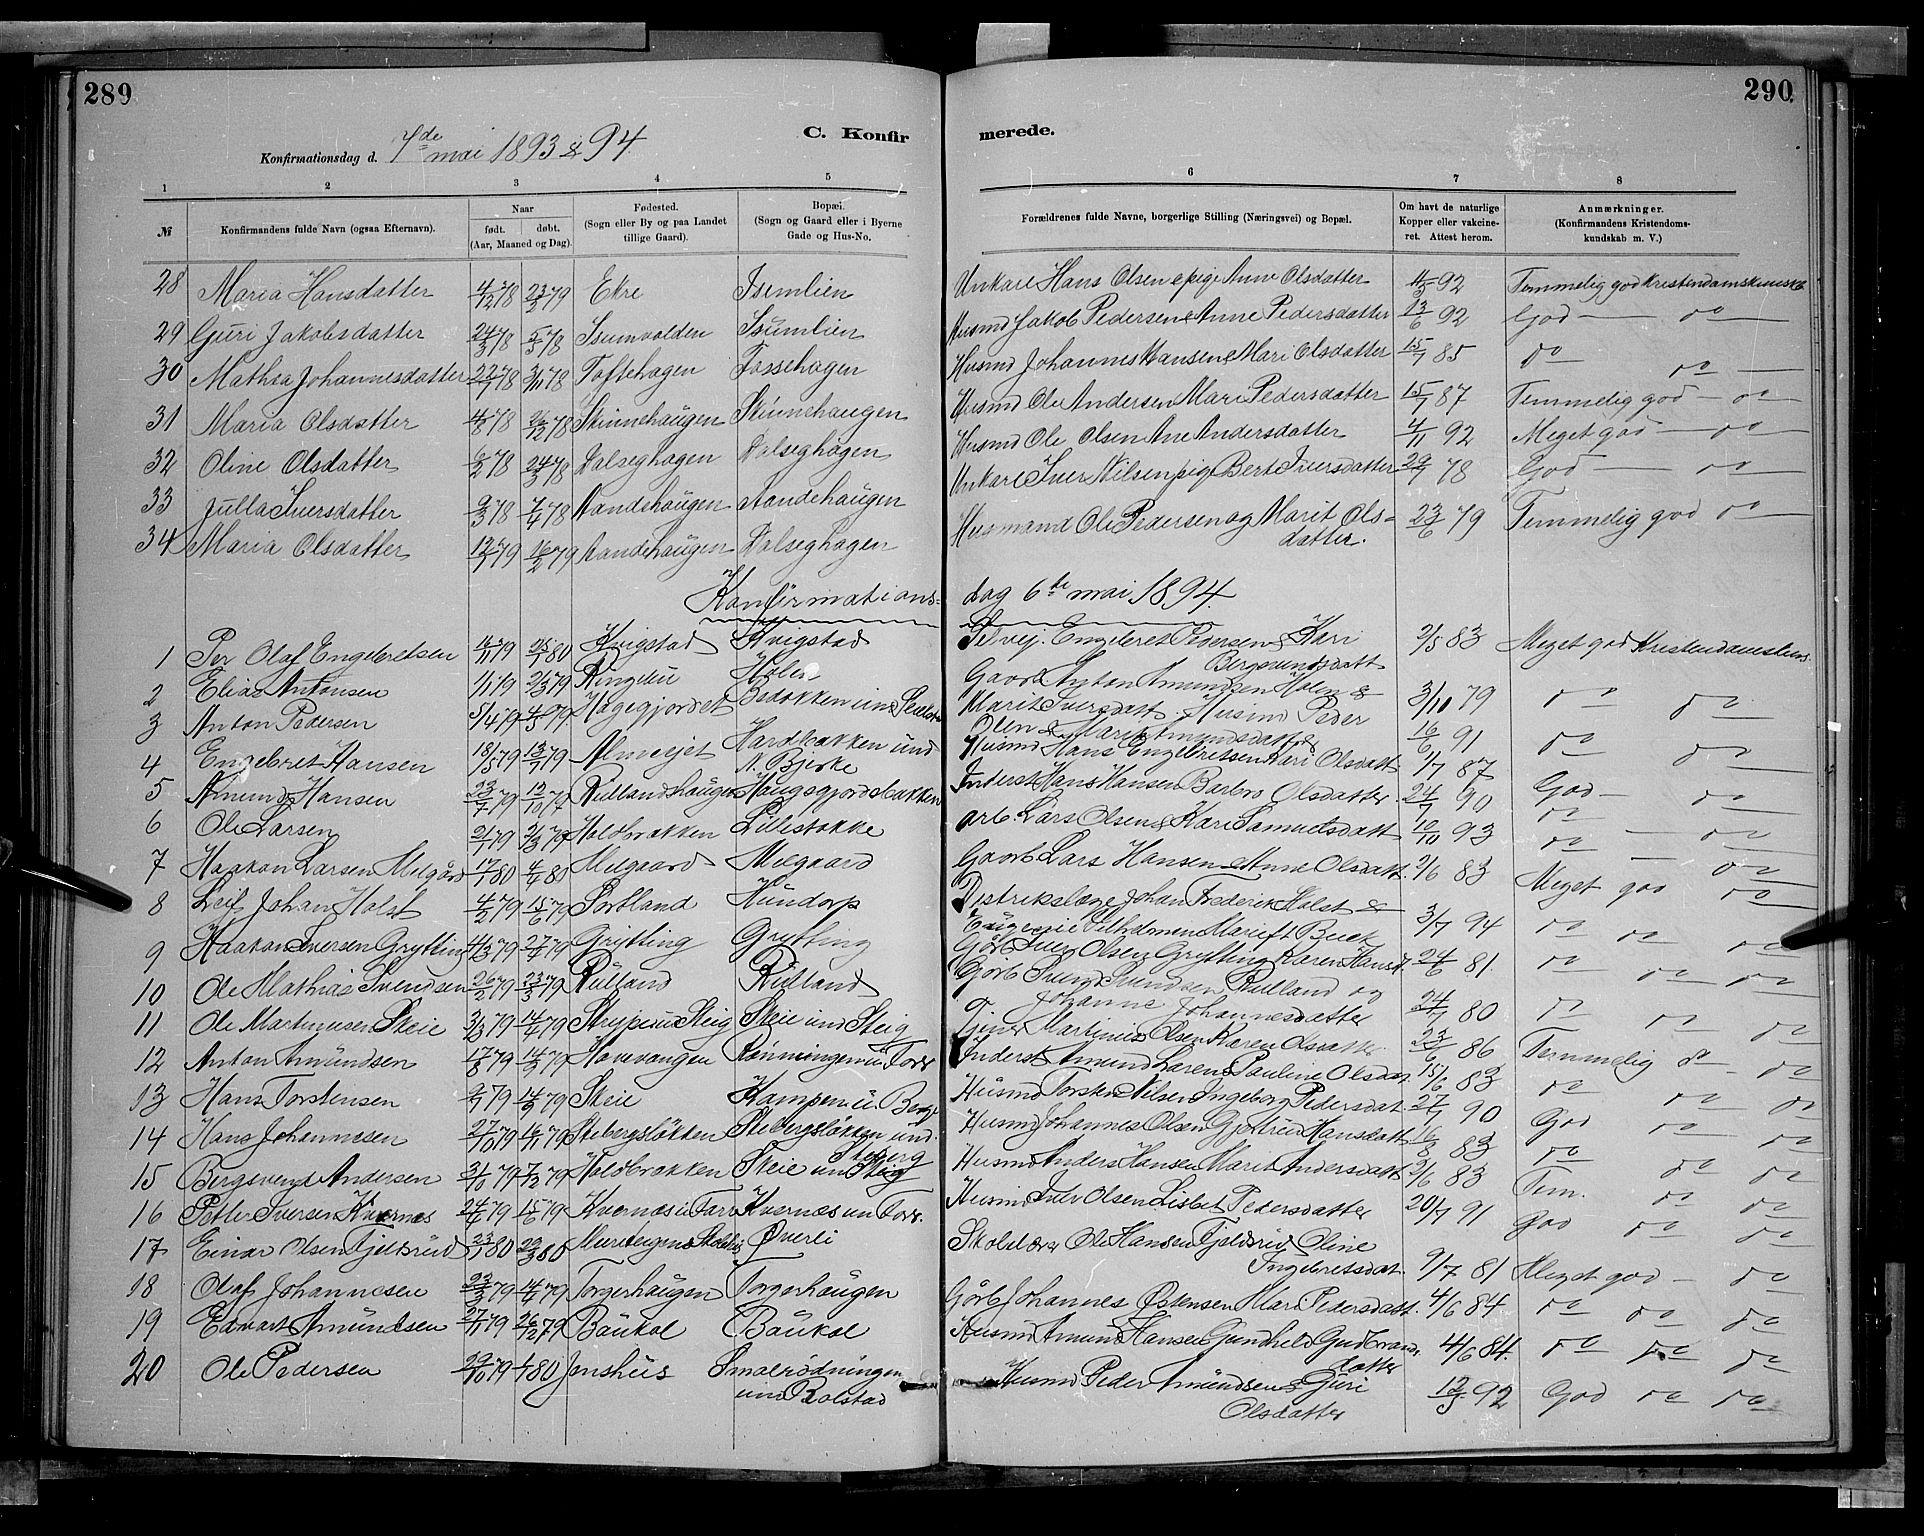 SAH, Sør-Fron prestekontor, H/Ha/Hab/L0003: Klokkerbok nr. 3, 1884-1896, s. 289-290